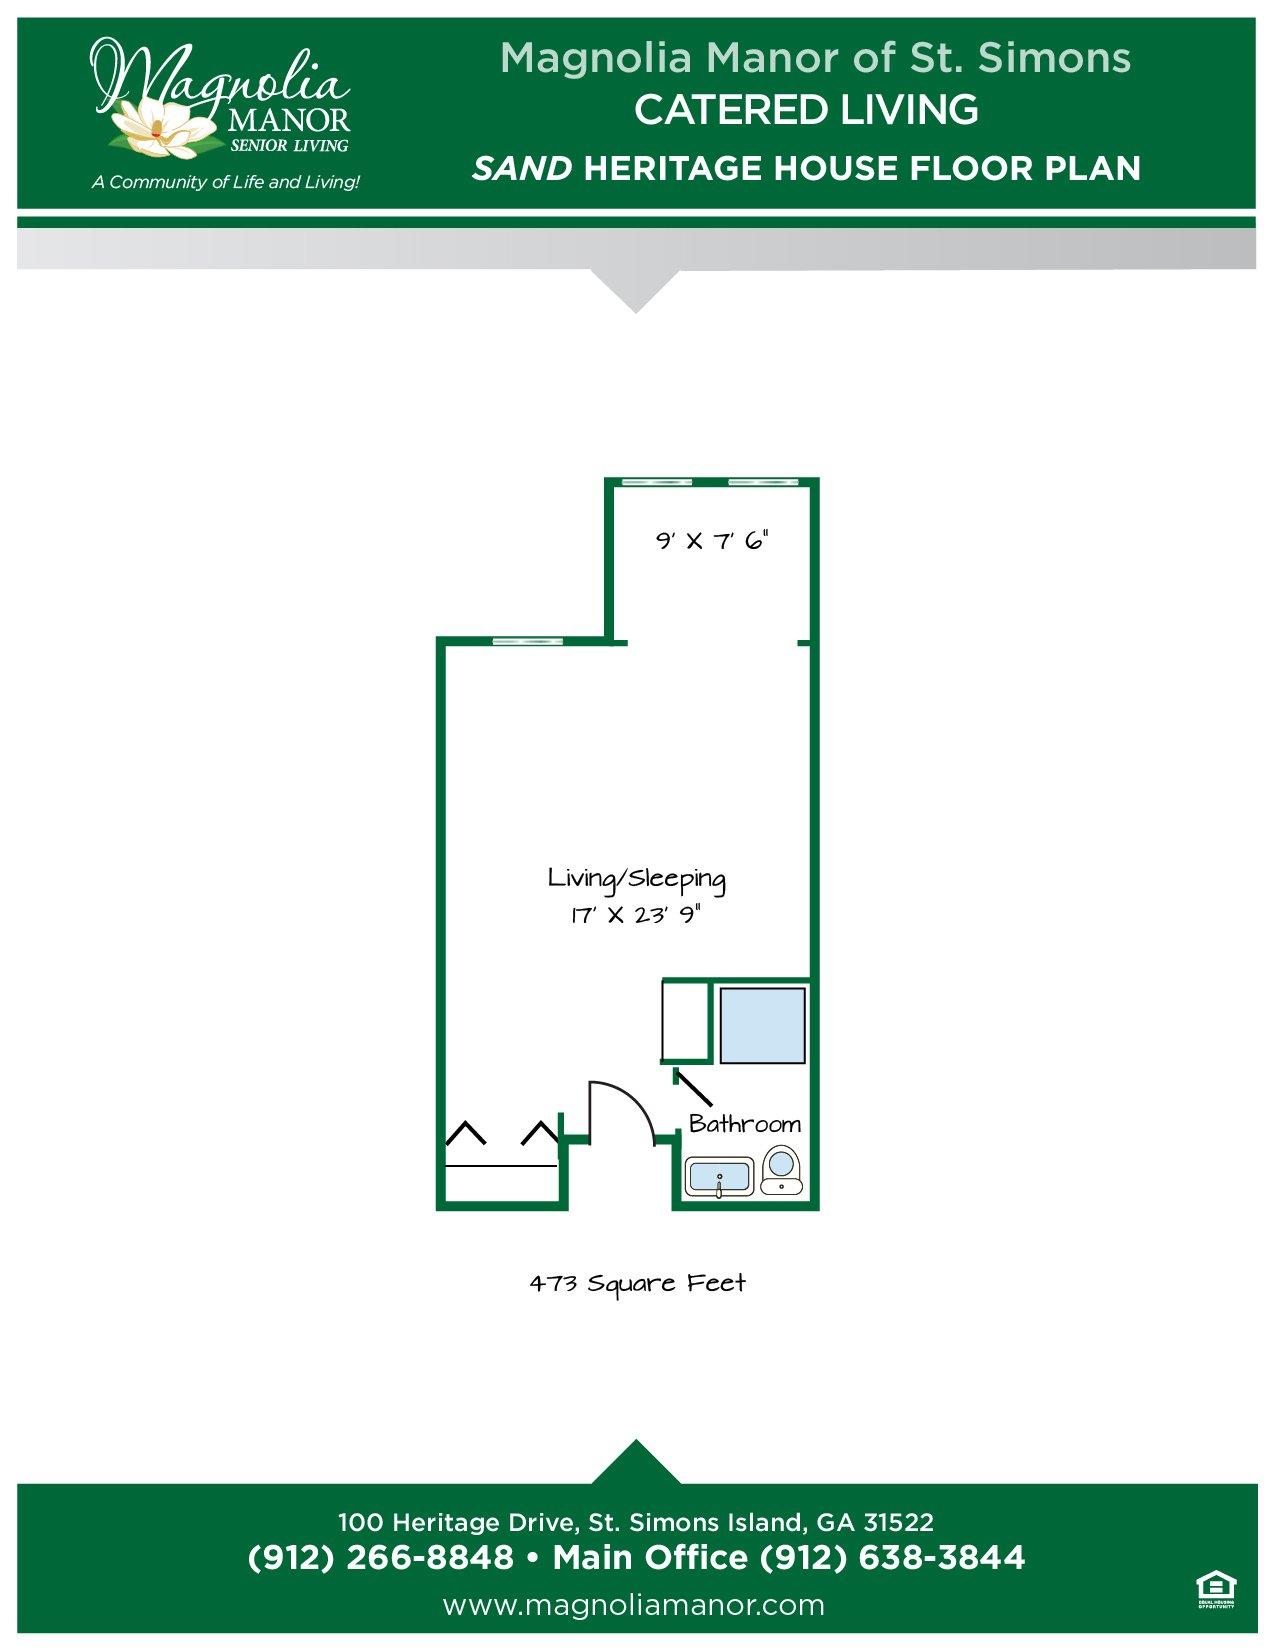 00344 St Simons CC SAND Heritage House Floor Plans 2019-01